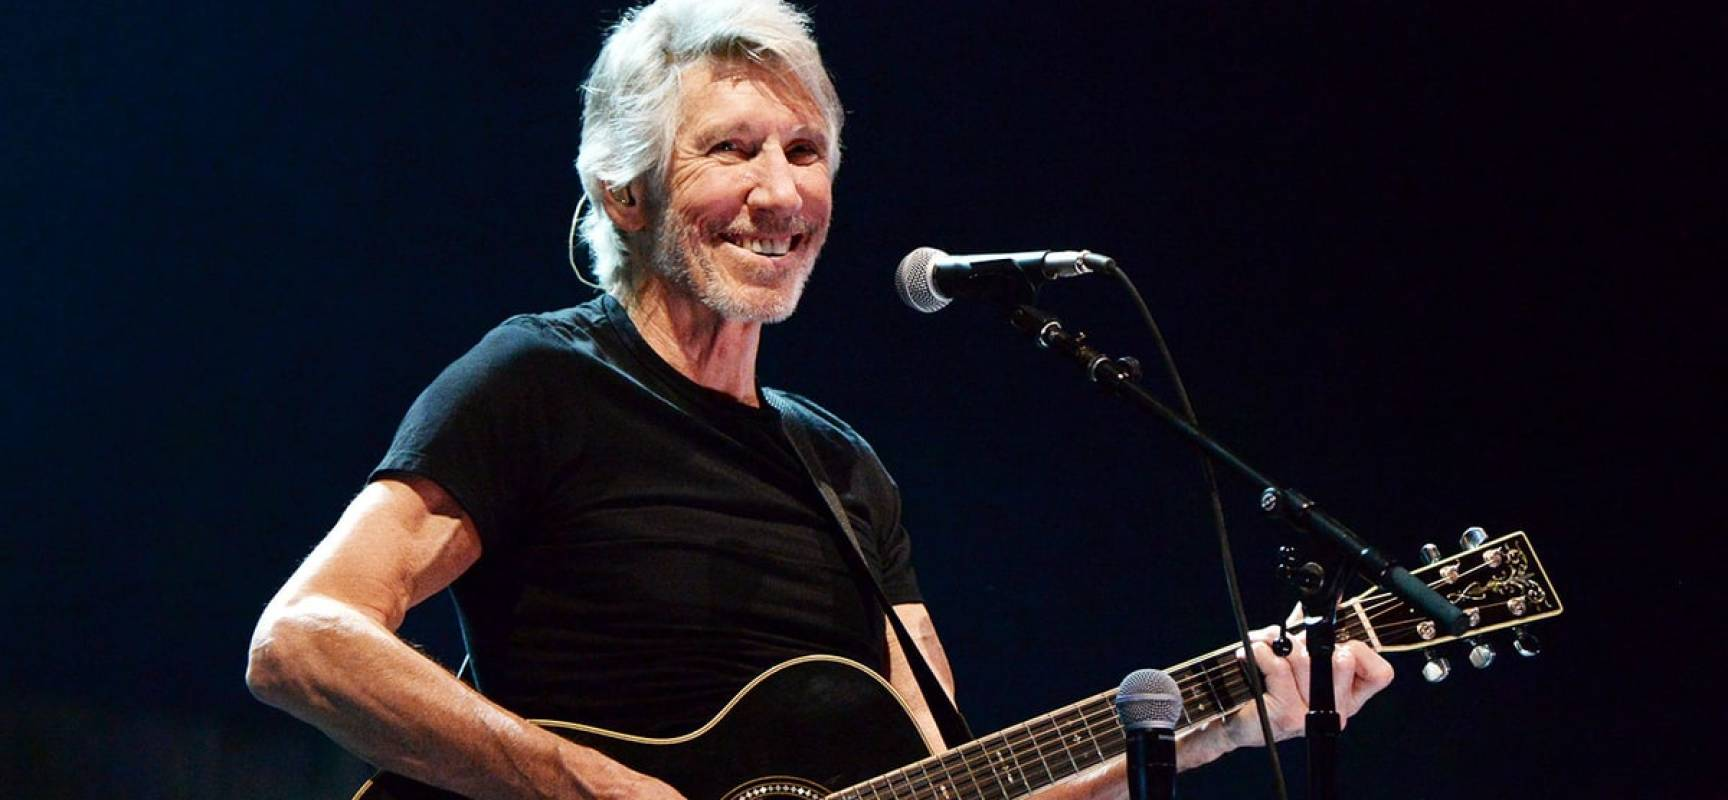 "Roger Waters porterà a Lucca lo spettacolare show ""Us + Them tour""."